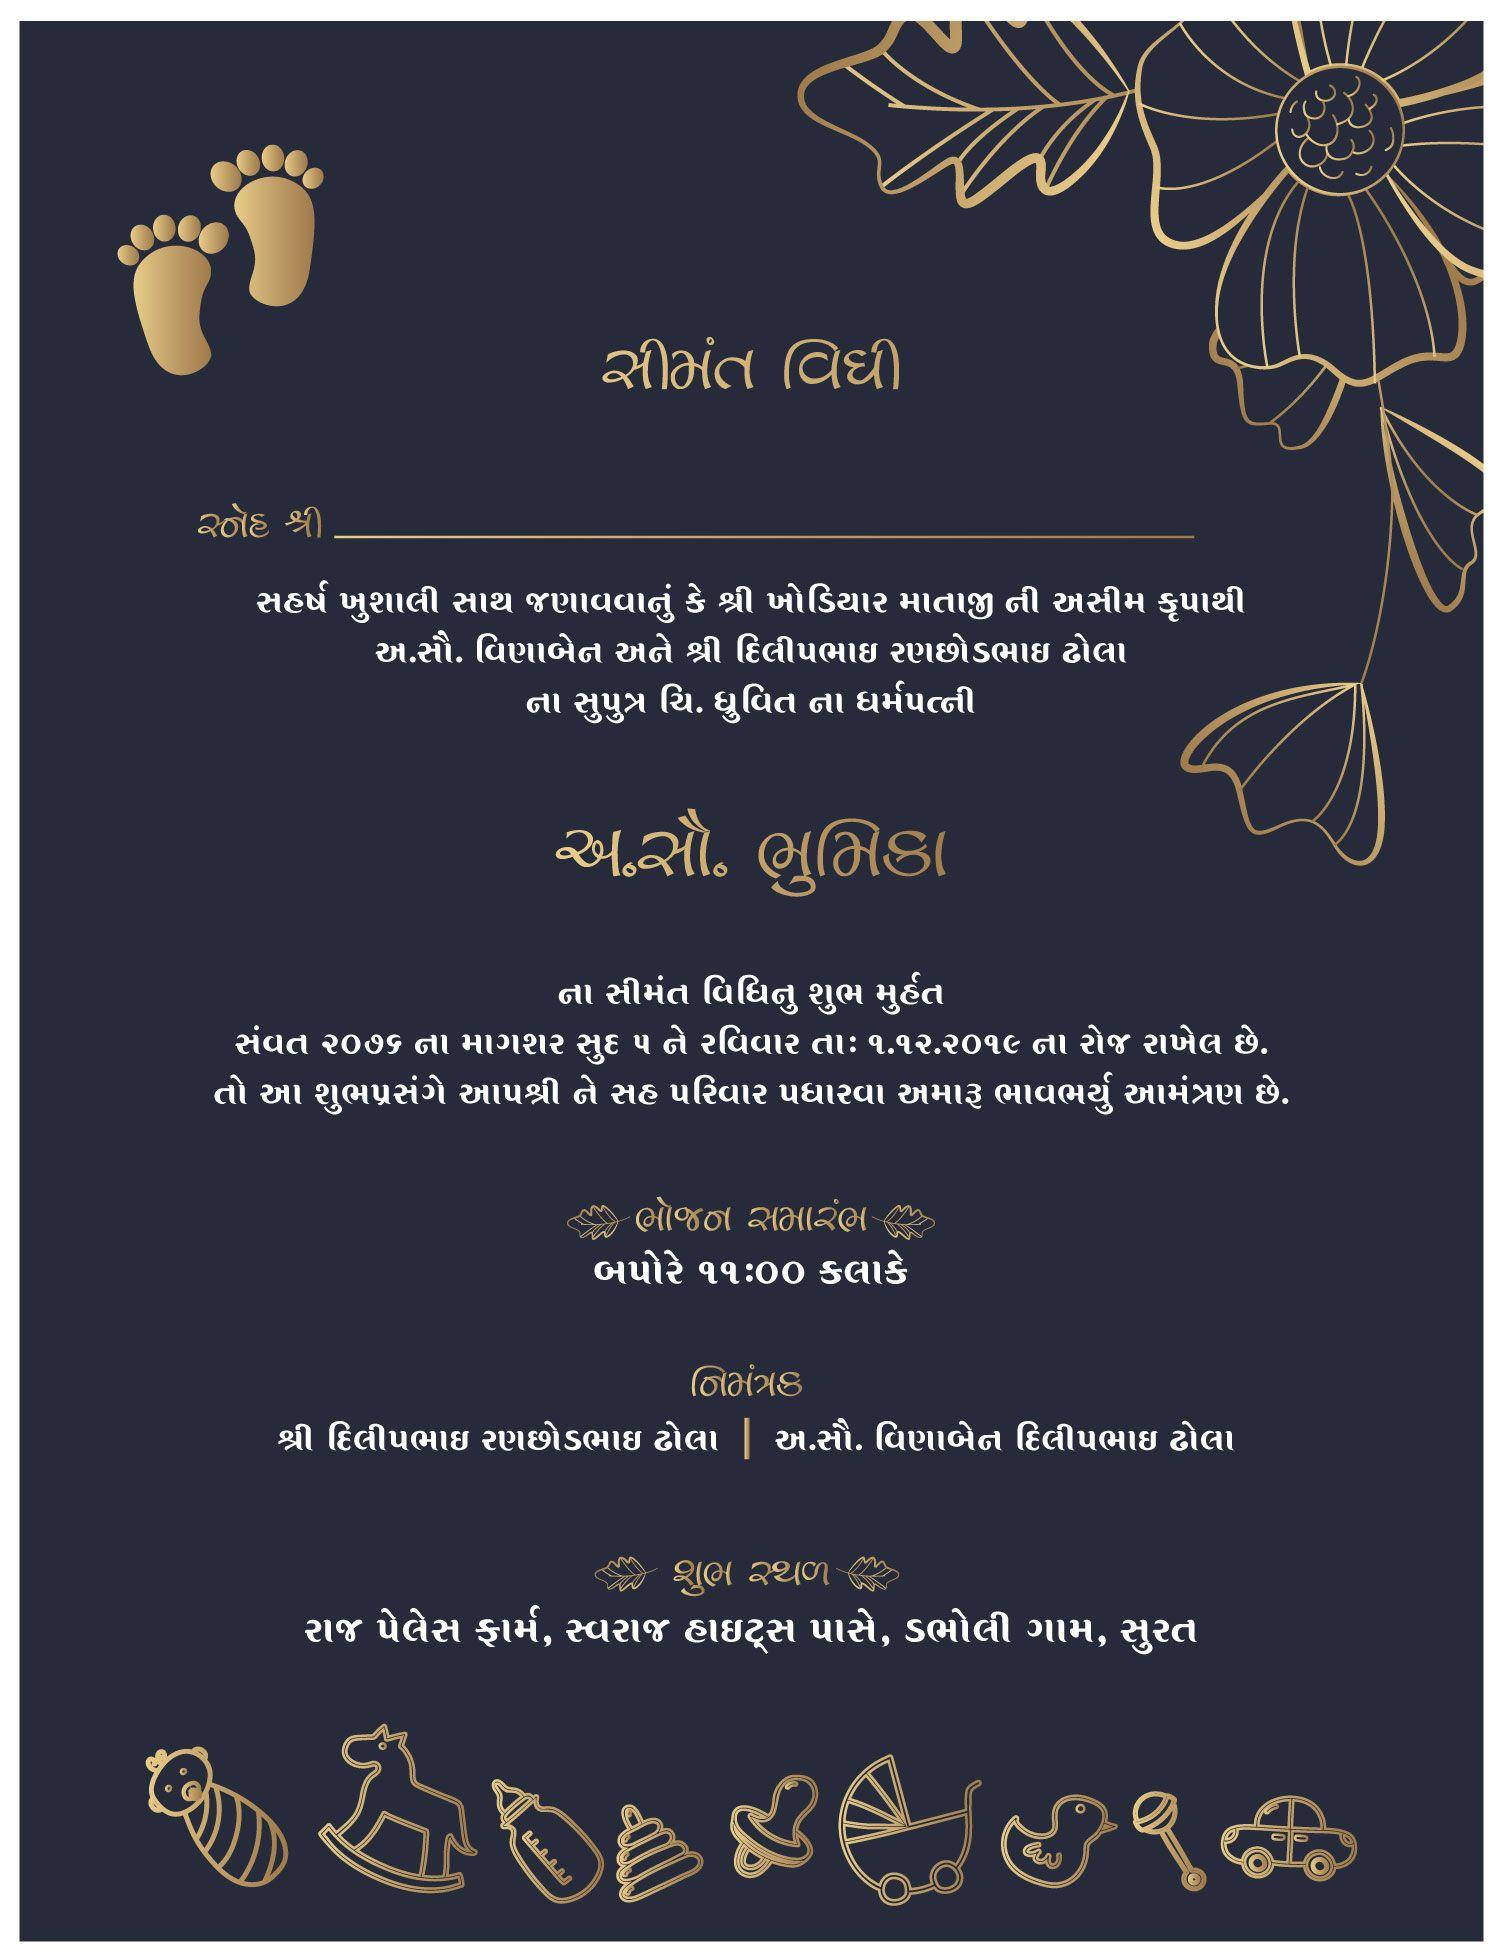 Shrimant Vidhi Gujarati Card : shrimant, vidhi, gujarati, Golden, Shower, Shrimant, Vidhi, Invitation, Design, Surat,, Gujarat,, India, Cards,, Invitations, Design,, Cards